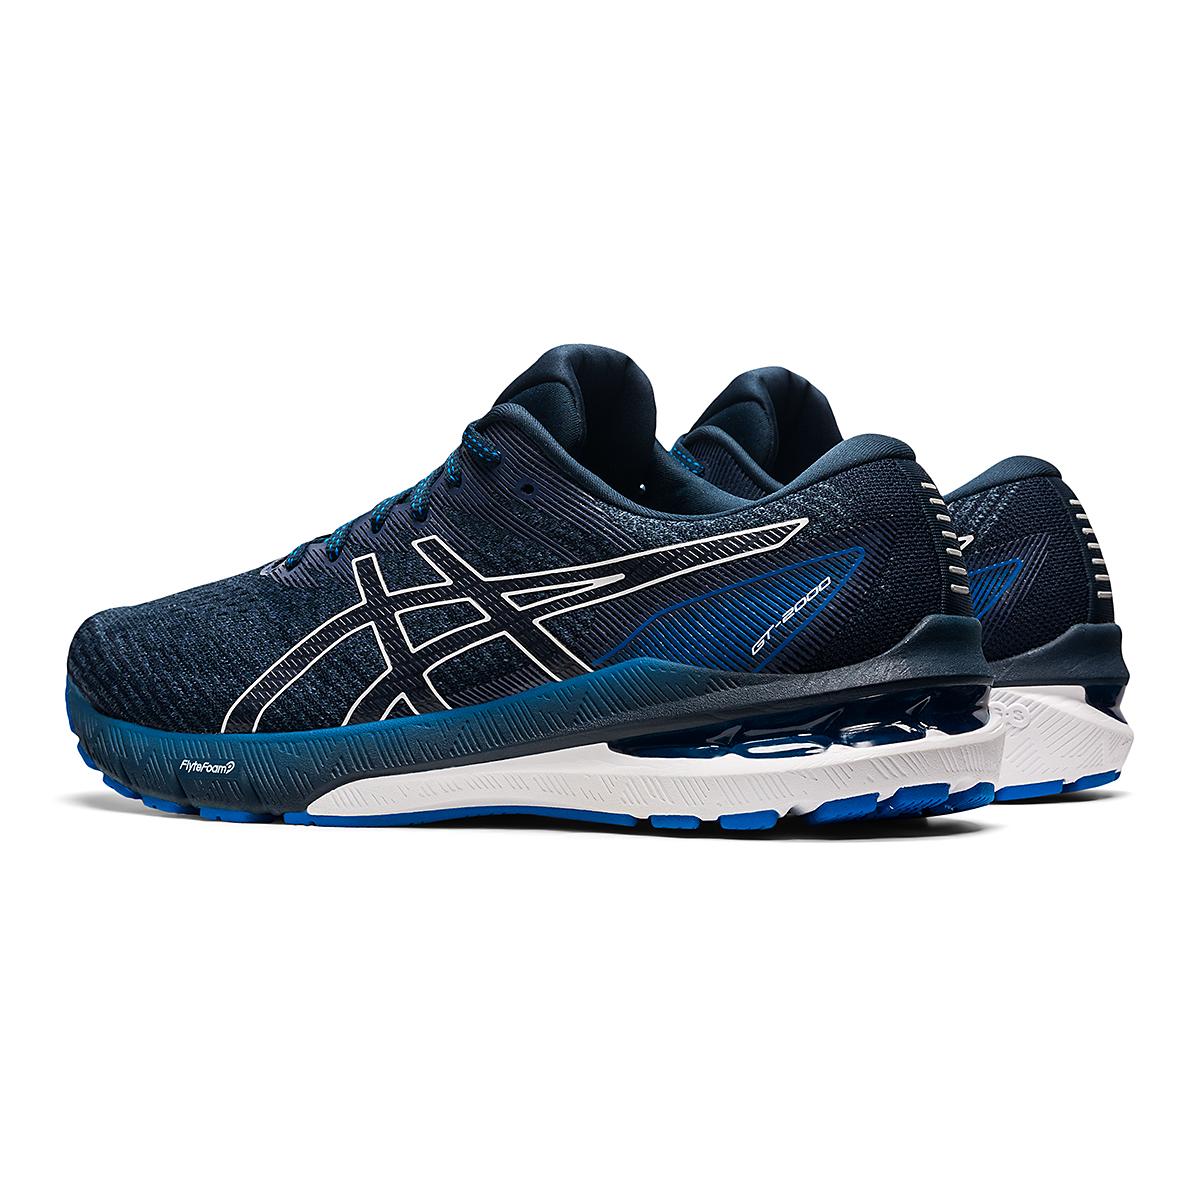 Men's Asics GT-2000 10 Running Shoe - Color: Thunder Blue/French Blue - Size: 7 - Width: Regular, Thunder Blue/French Blue, large, image 4